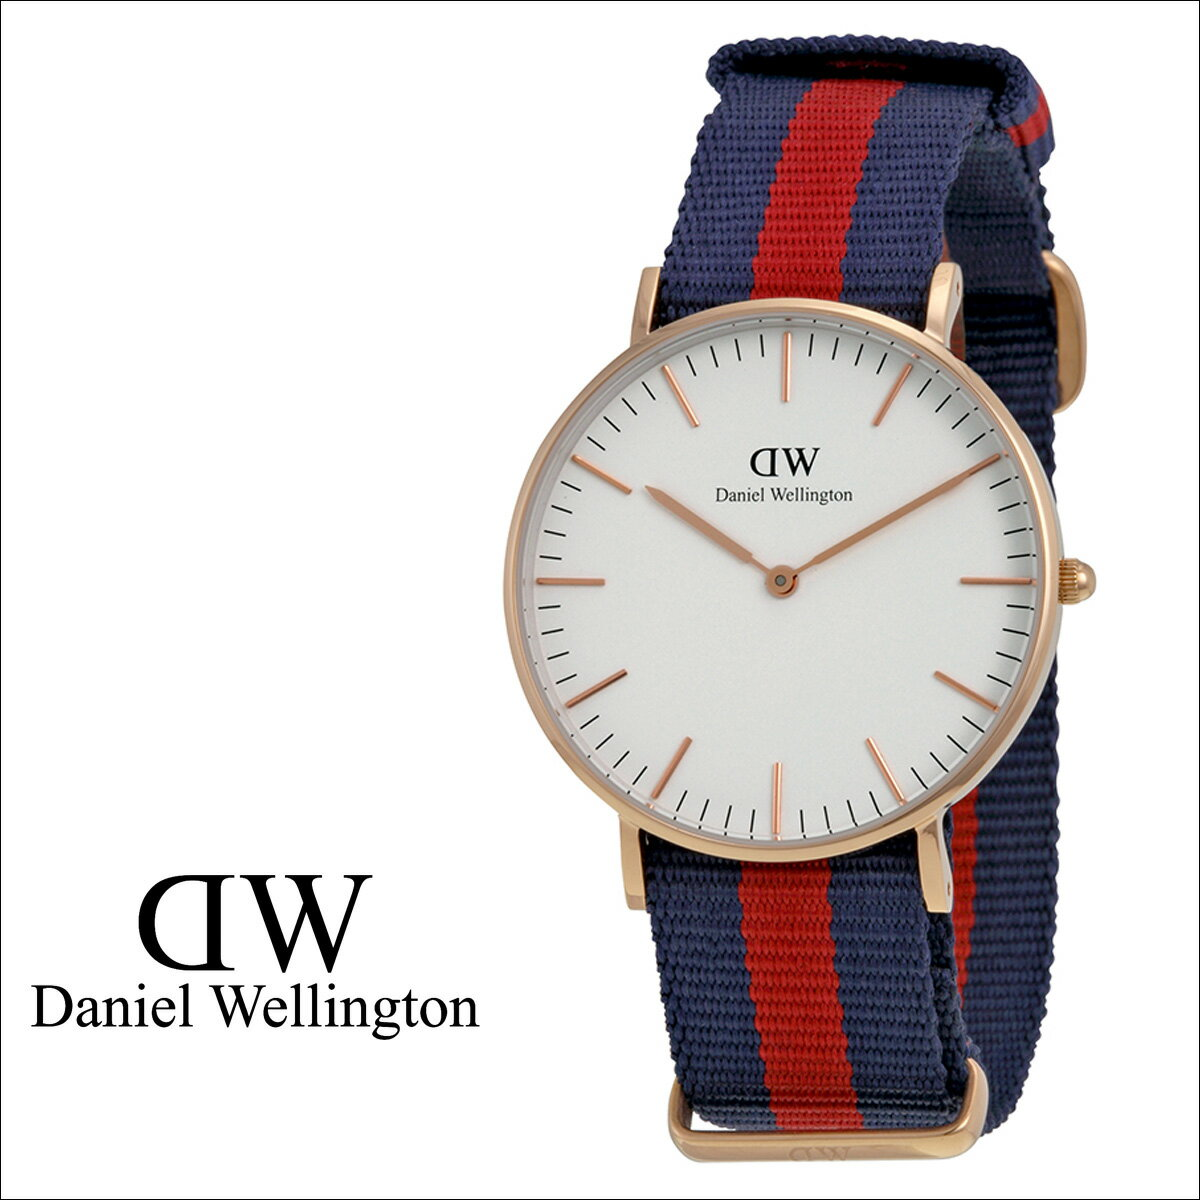 Daniel Wellington ダニエルウェリントン 36mm 腕時計 レディース  CLASSIC OXFORD LADY  ローズゴールド NATO  送料無料  Daniel Wellington ダニエルウェリントン 腕時計 36ミリ 正規  通販